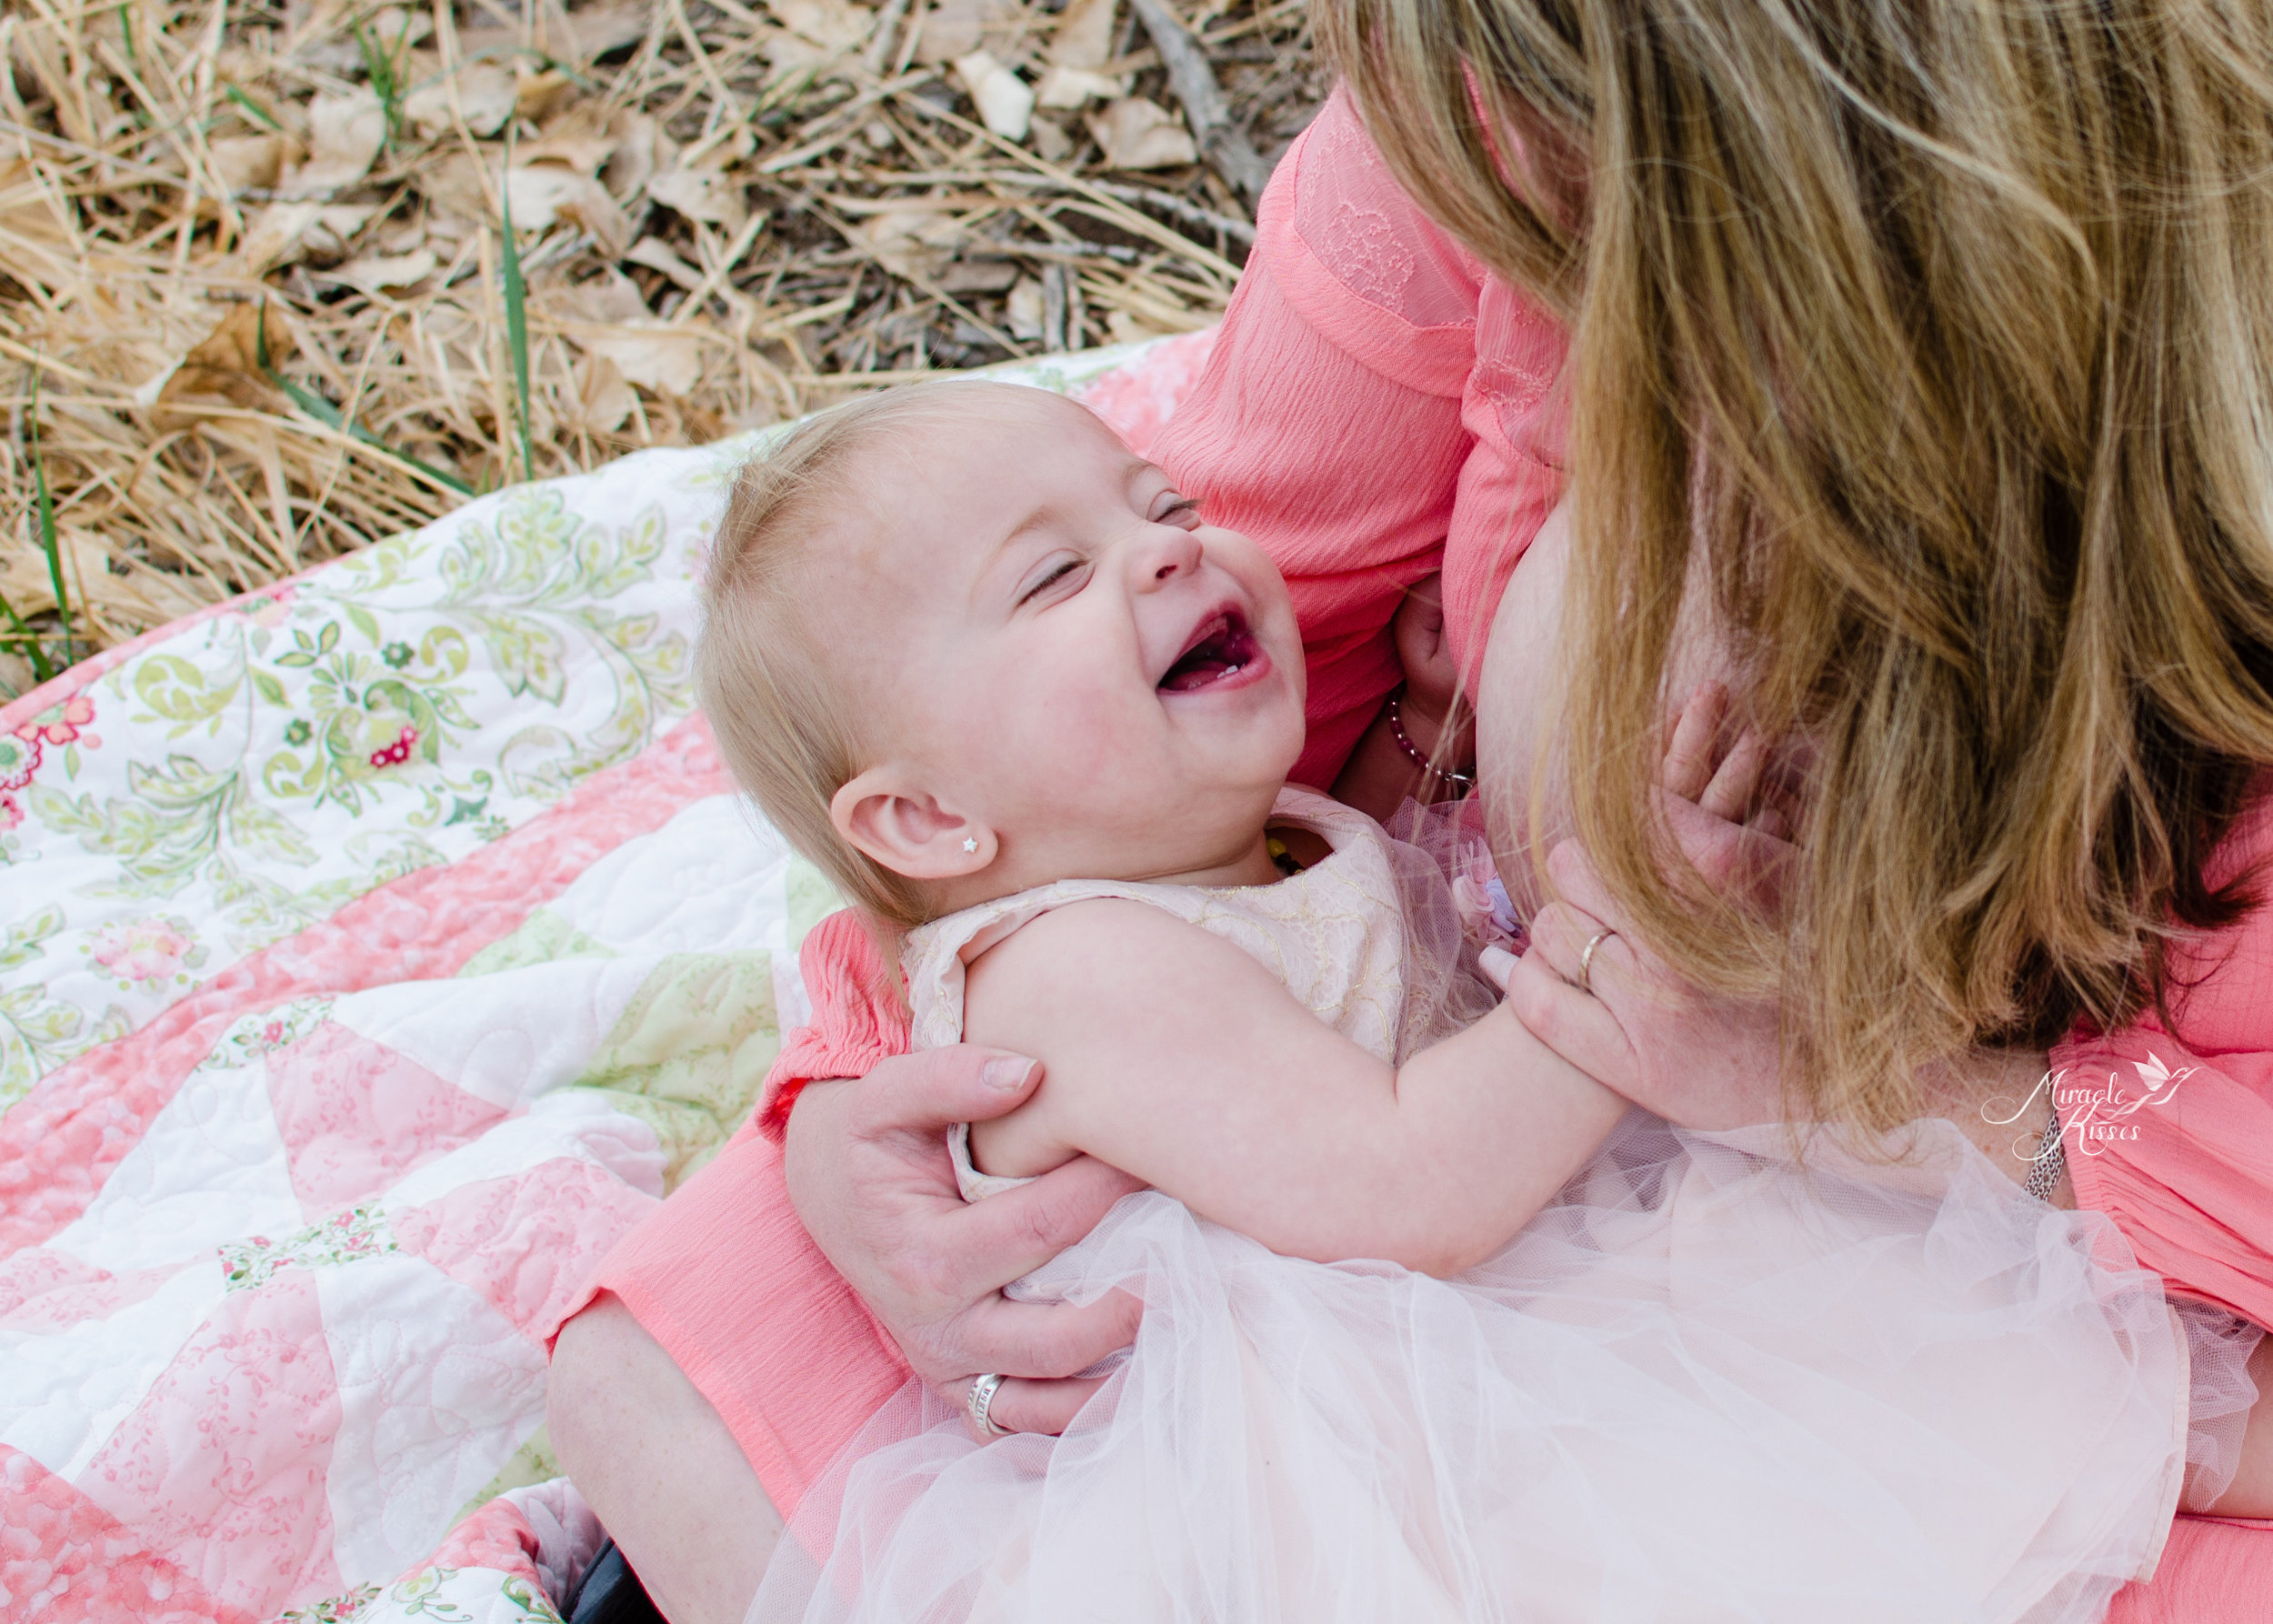 giggle nursing, happy child, breastmilk is magic